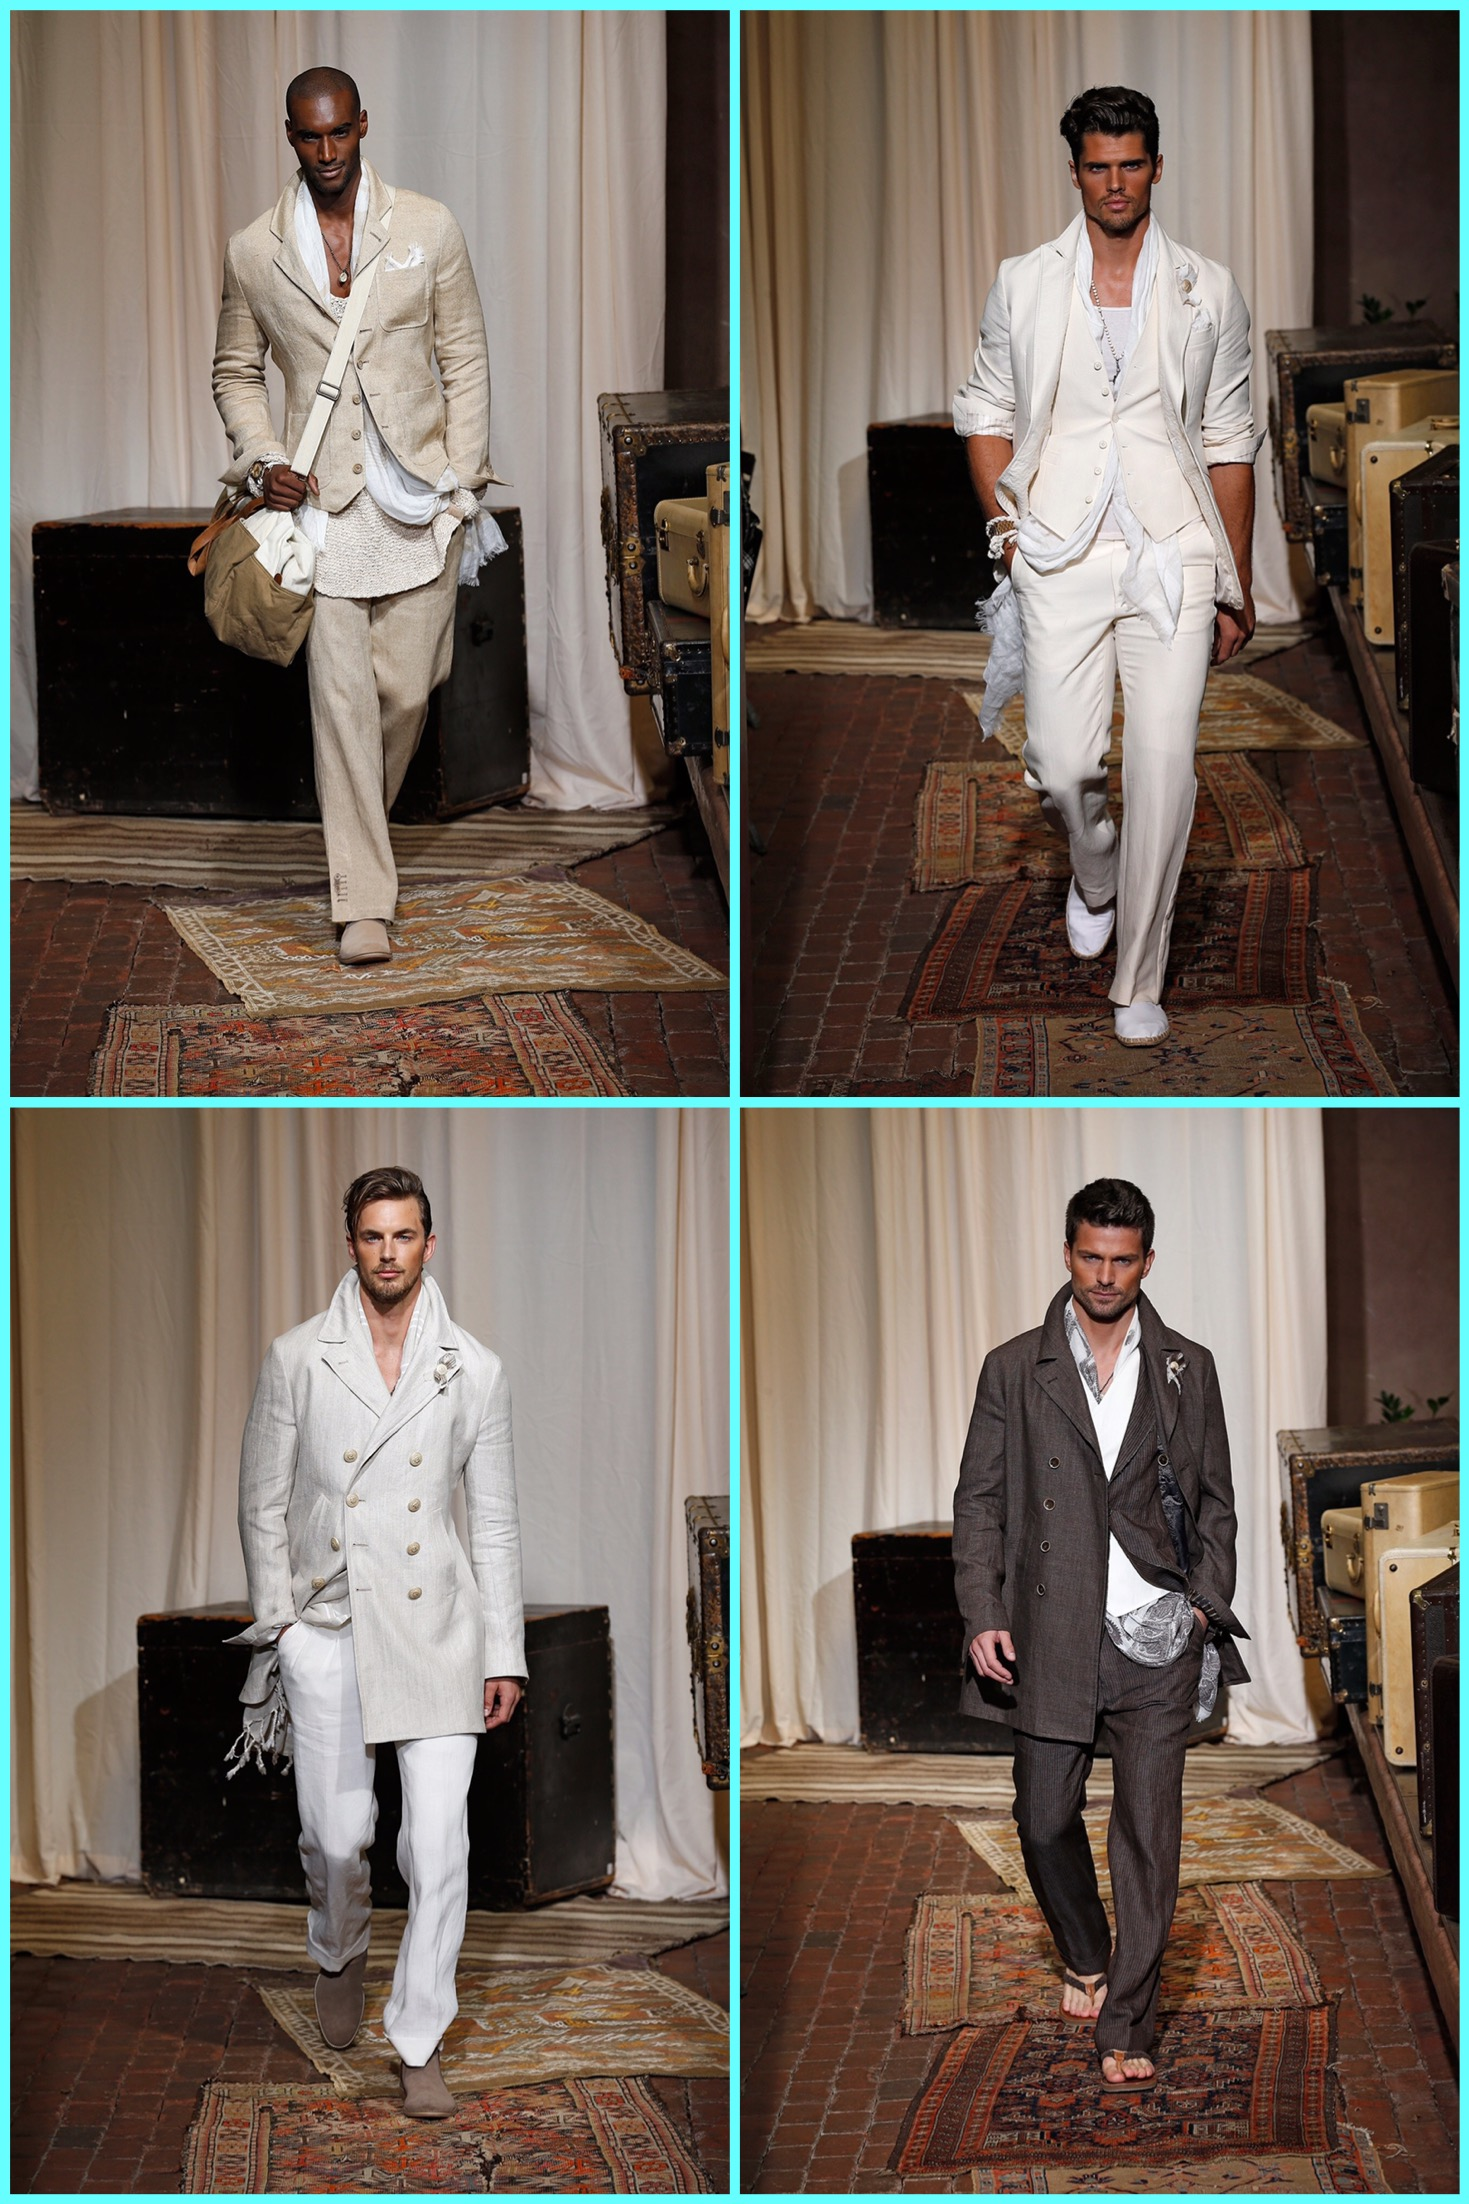 ny-fashion-week-menswear-spring-summer-2017-style-joseph-abboud